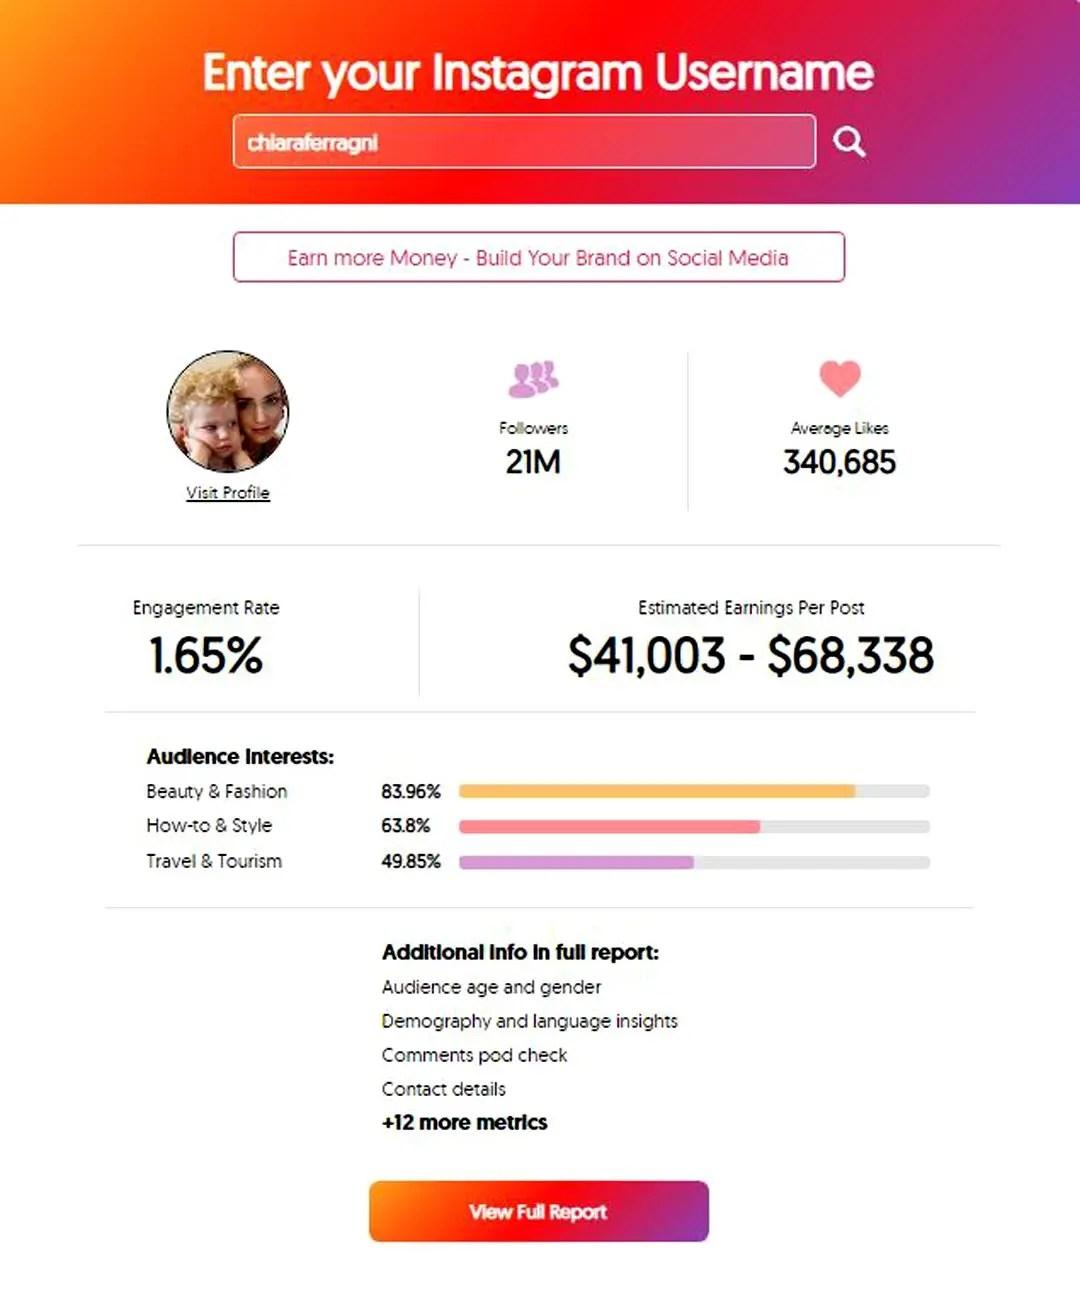 Quanto costa un post su Instagram